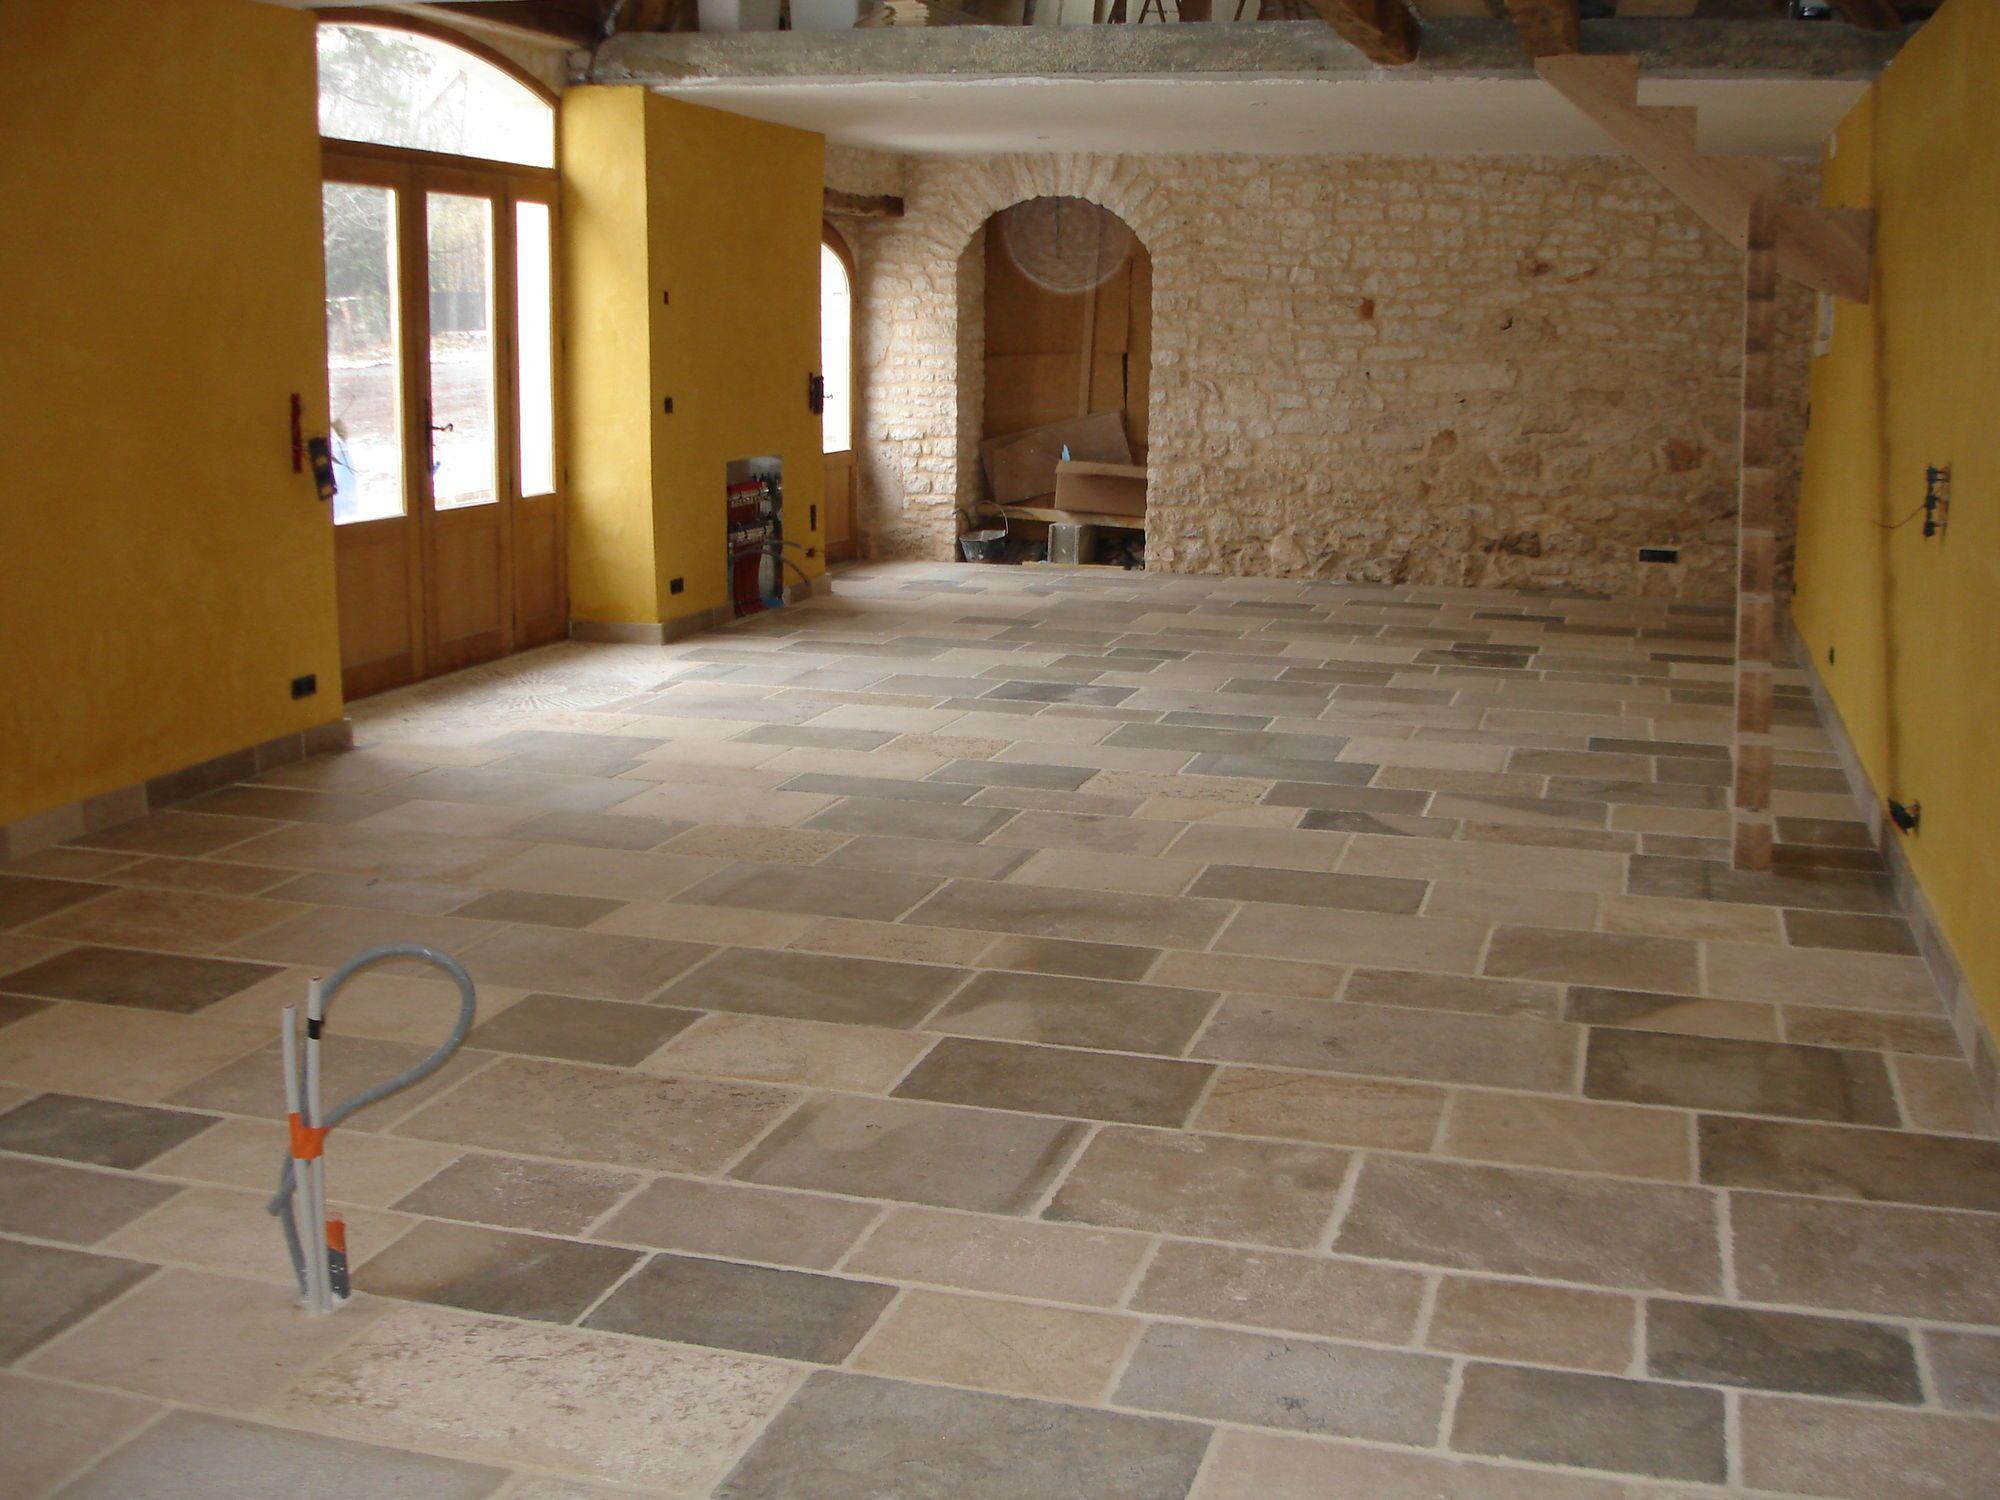 Accessories furnitureattractive natural flagstone floor tile with accessories furnitureattractive natural flagstone floor tile with diagonal tile designbest inspiring dailygadgetfo Images